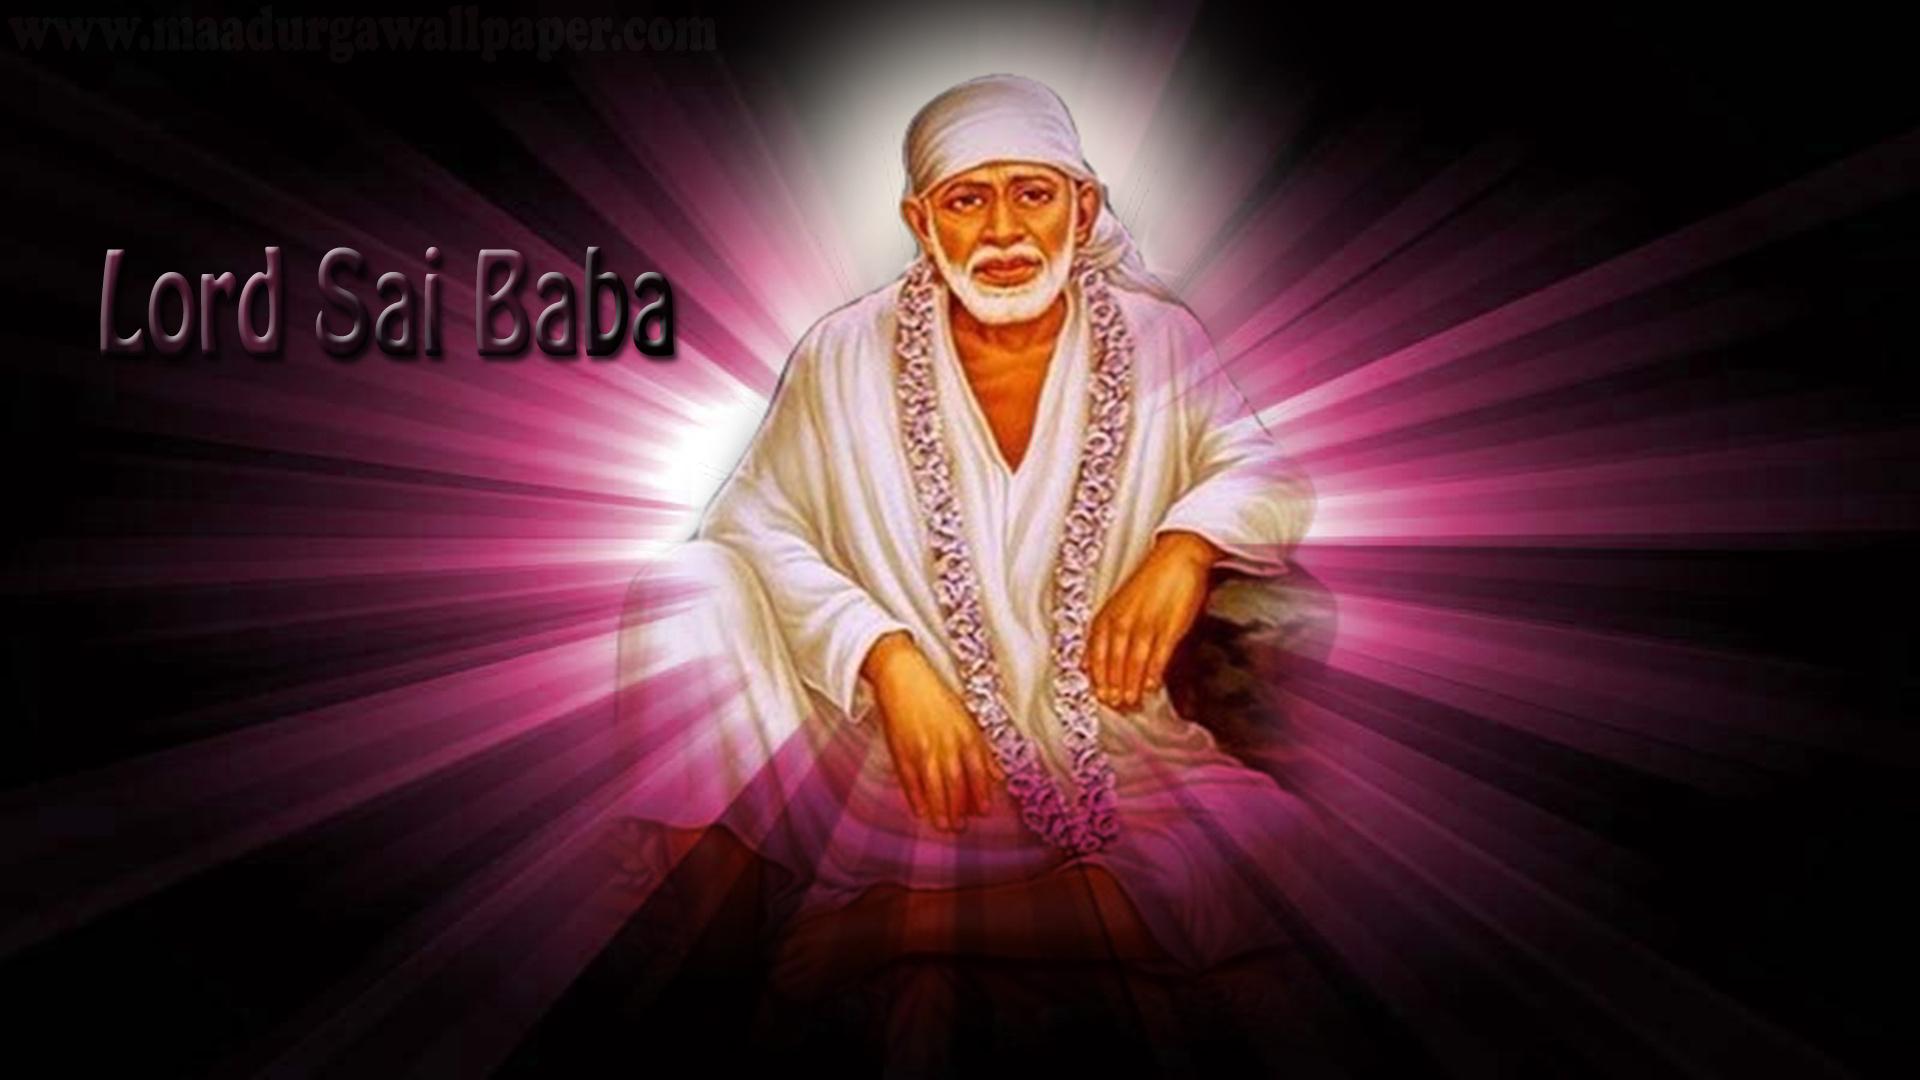 Sai baba Wallpaper | Sai Baba images | Shirdi Sai Baba HD Photo